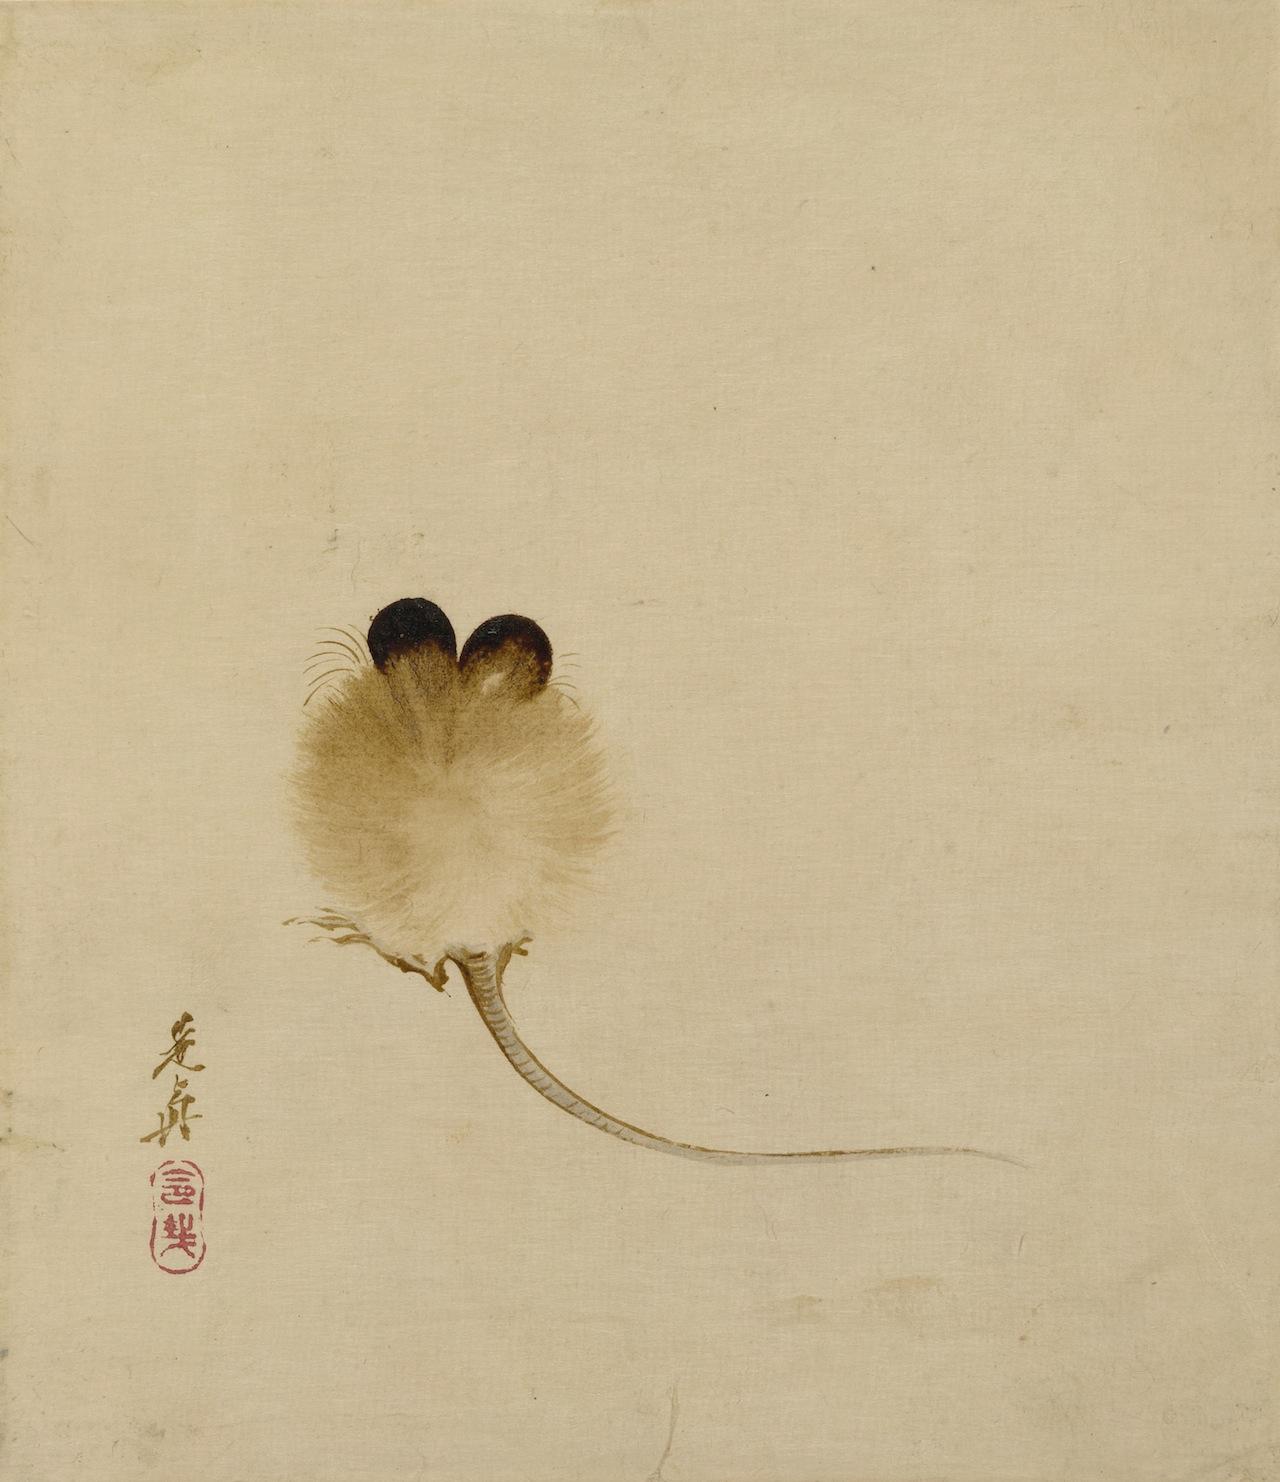 Shibata Zeshin, Mouse, nineteenth century, lacquer on paper. Object reg. no: 1928,0720,0.35, British Museum, London, United Kingdom. © The Trustees of the British Museum/Art Resource, NY.